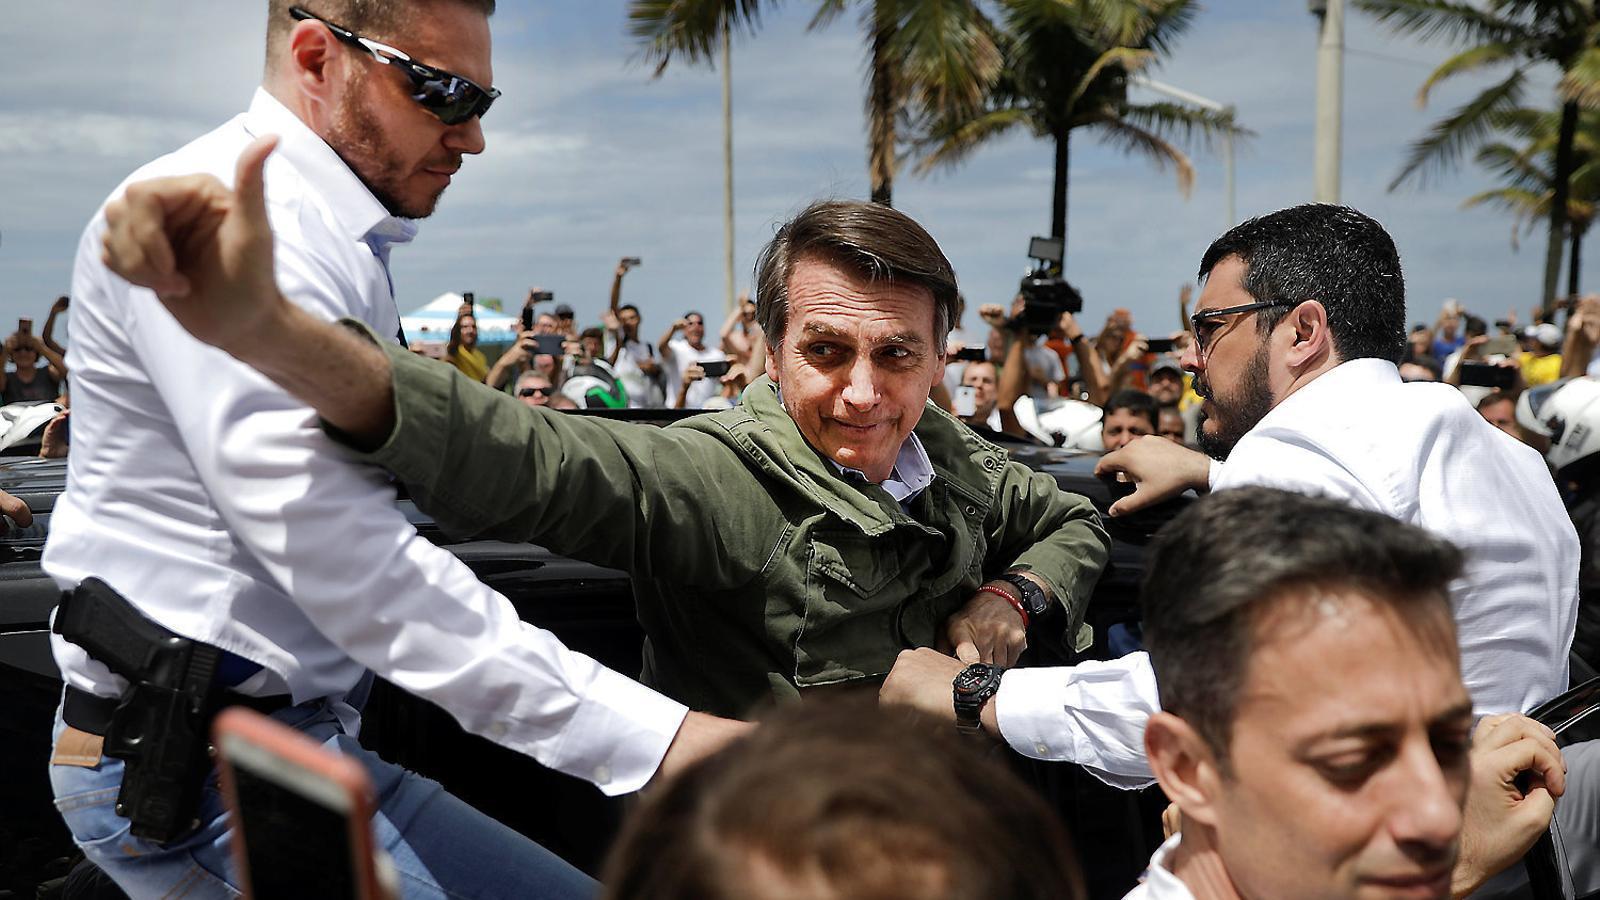 La recepta de Bolsonaro: privatitzar i retallar pensions